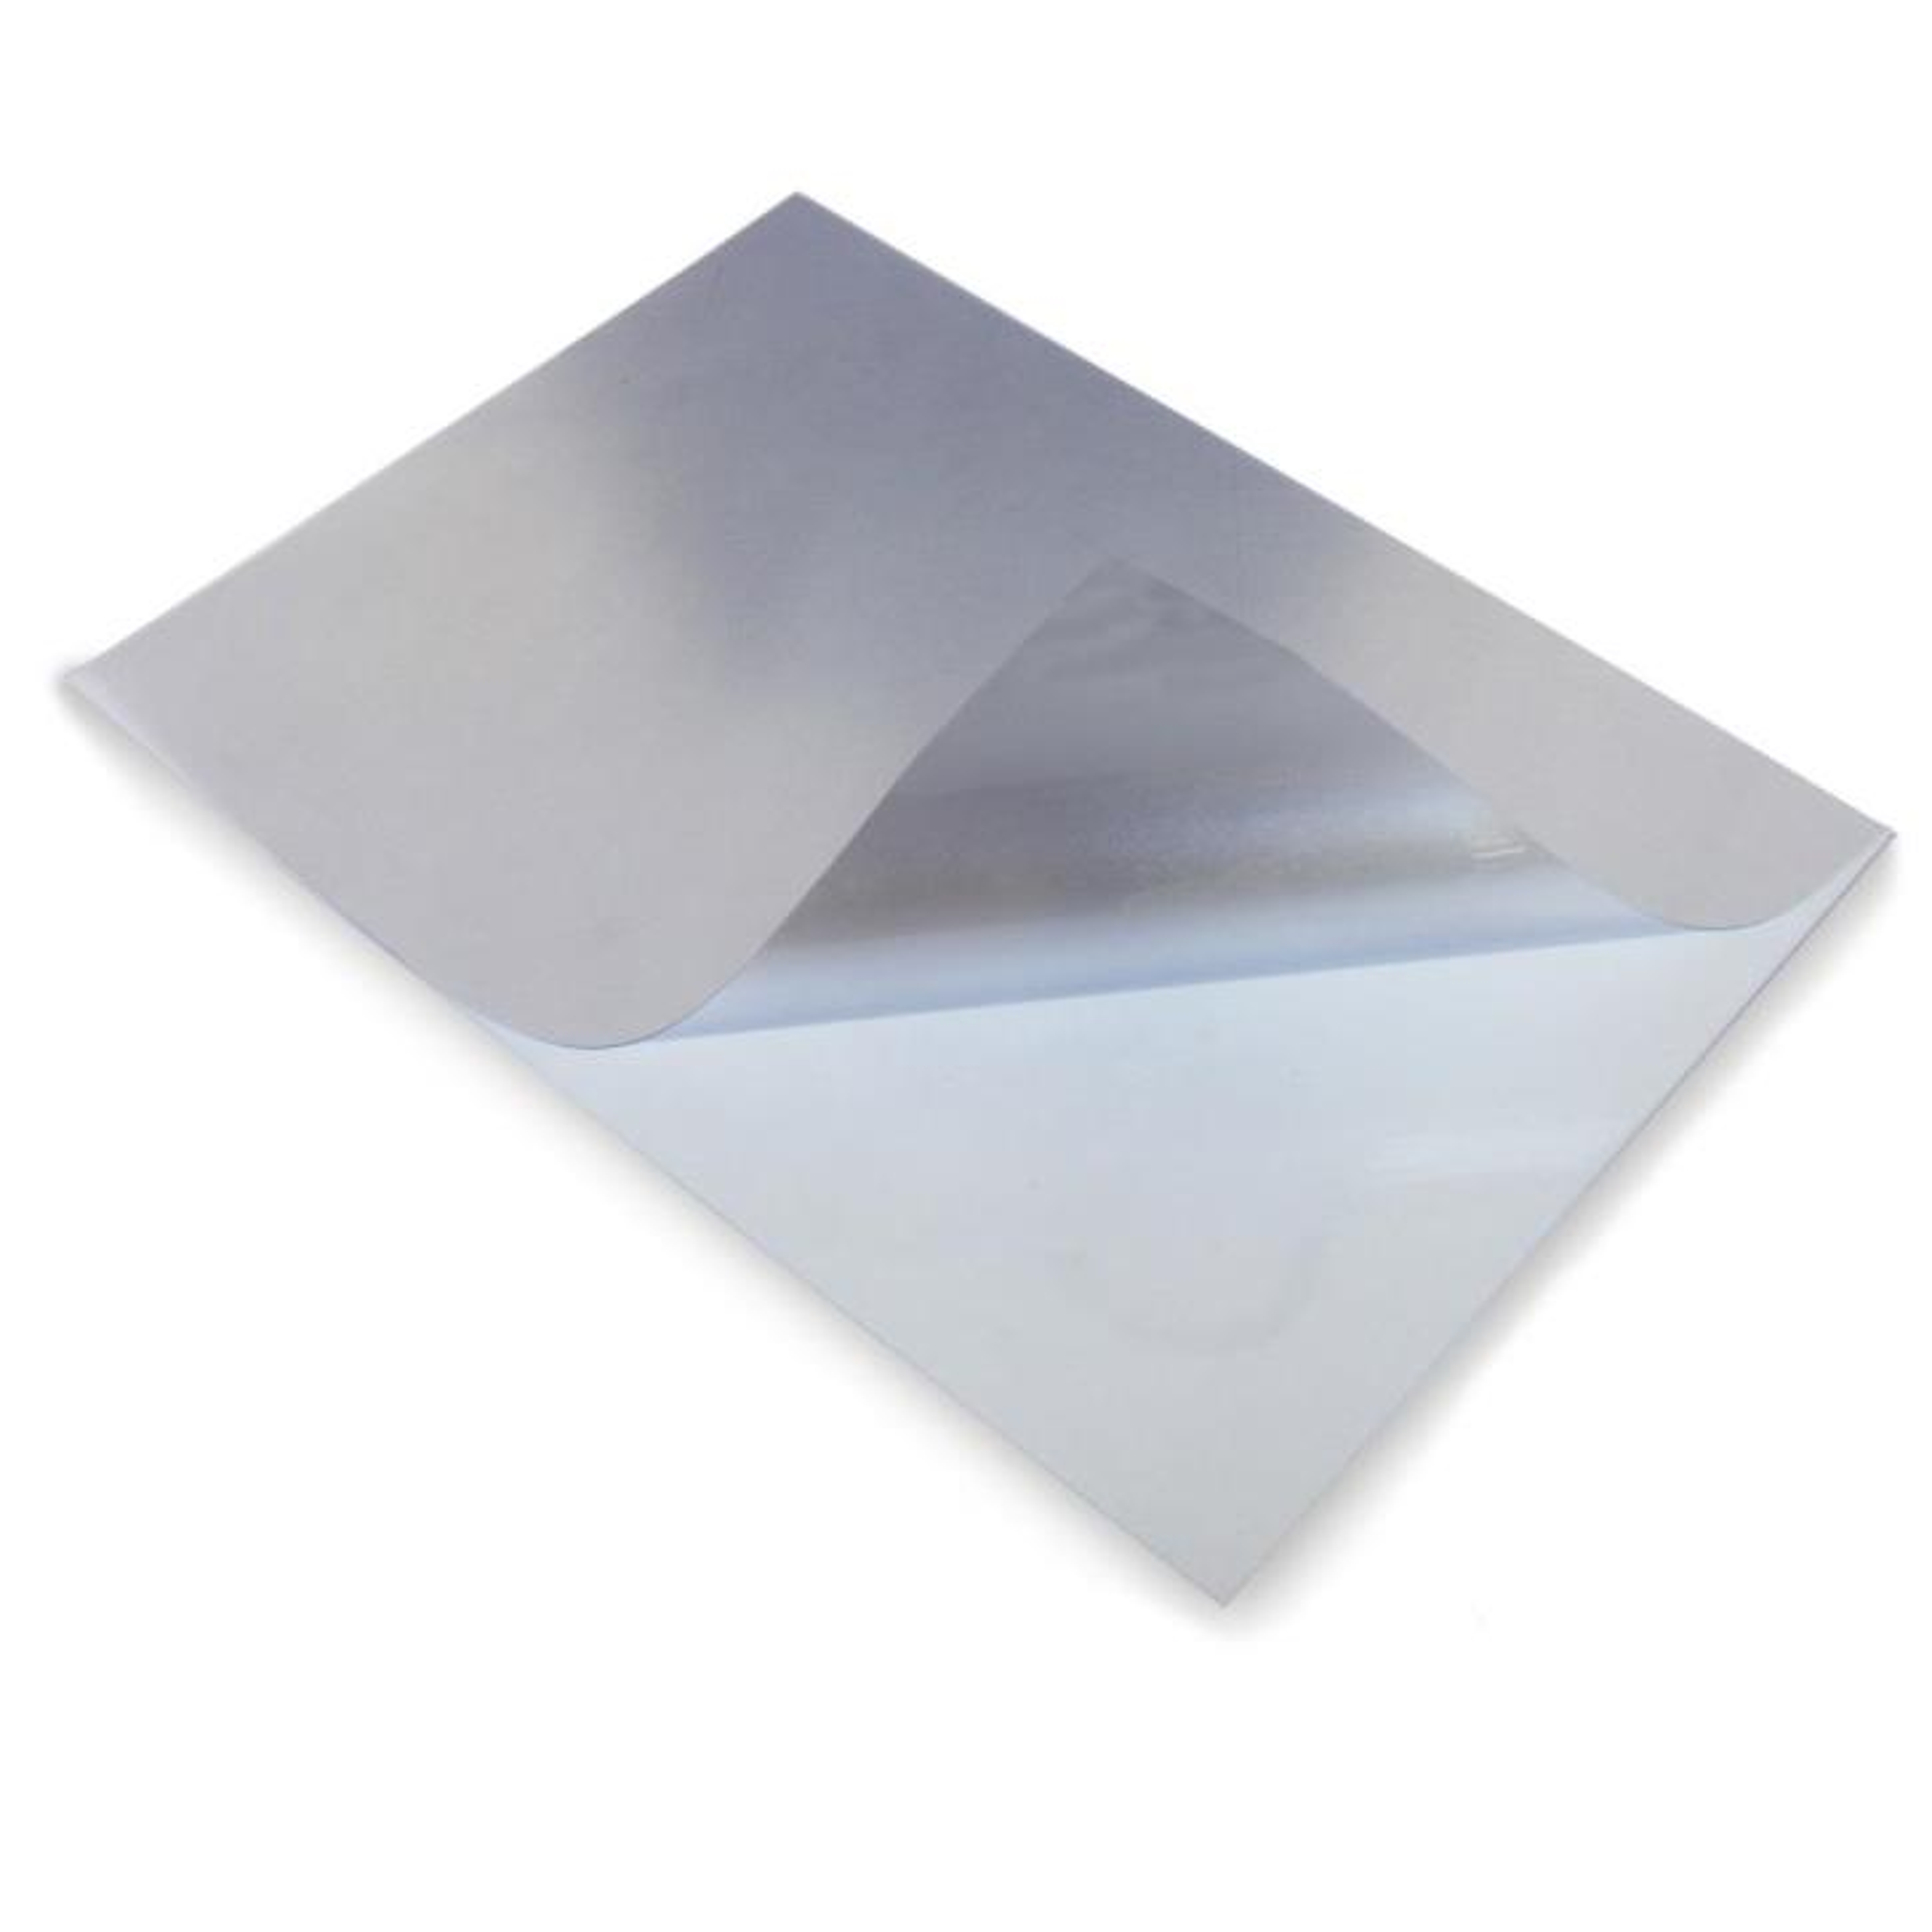 A5 U-Tasche PVC, transp. für Plakatrahmen